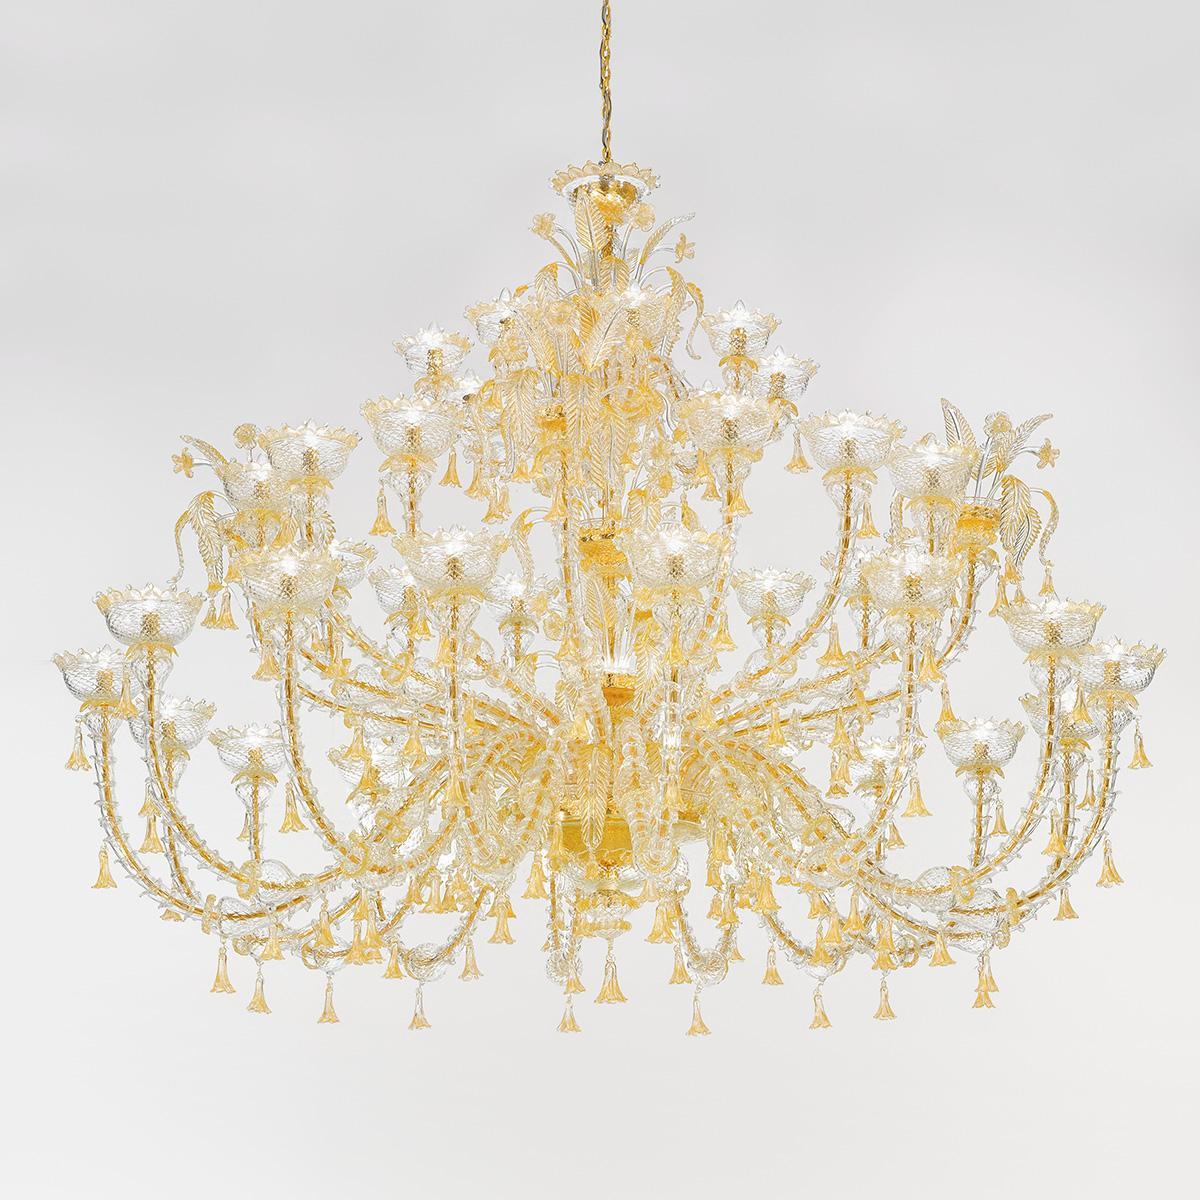 """Silvana"" lustre en cristal de Murano - 32+8 lumières - or"